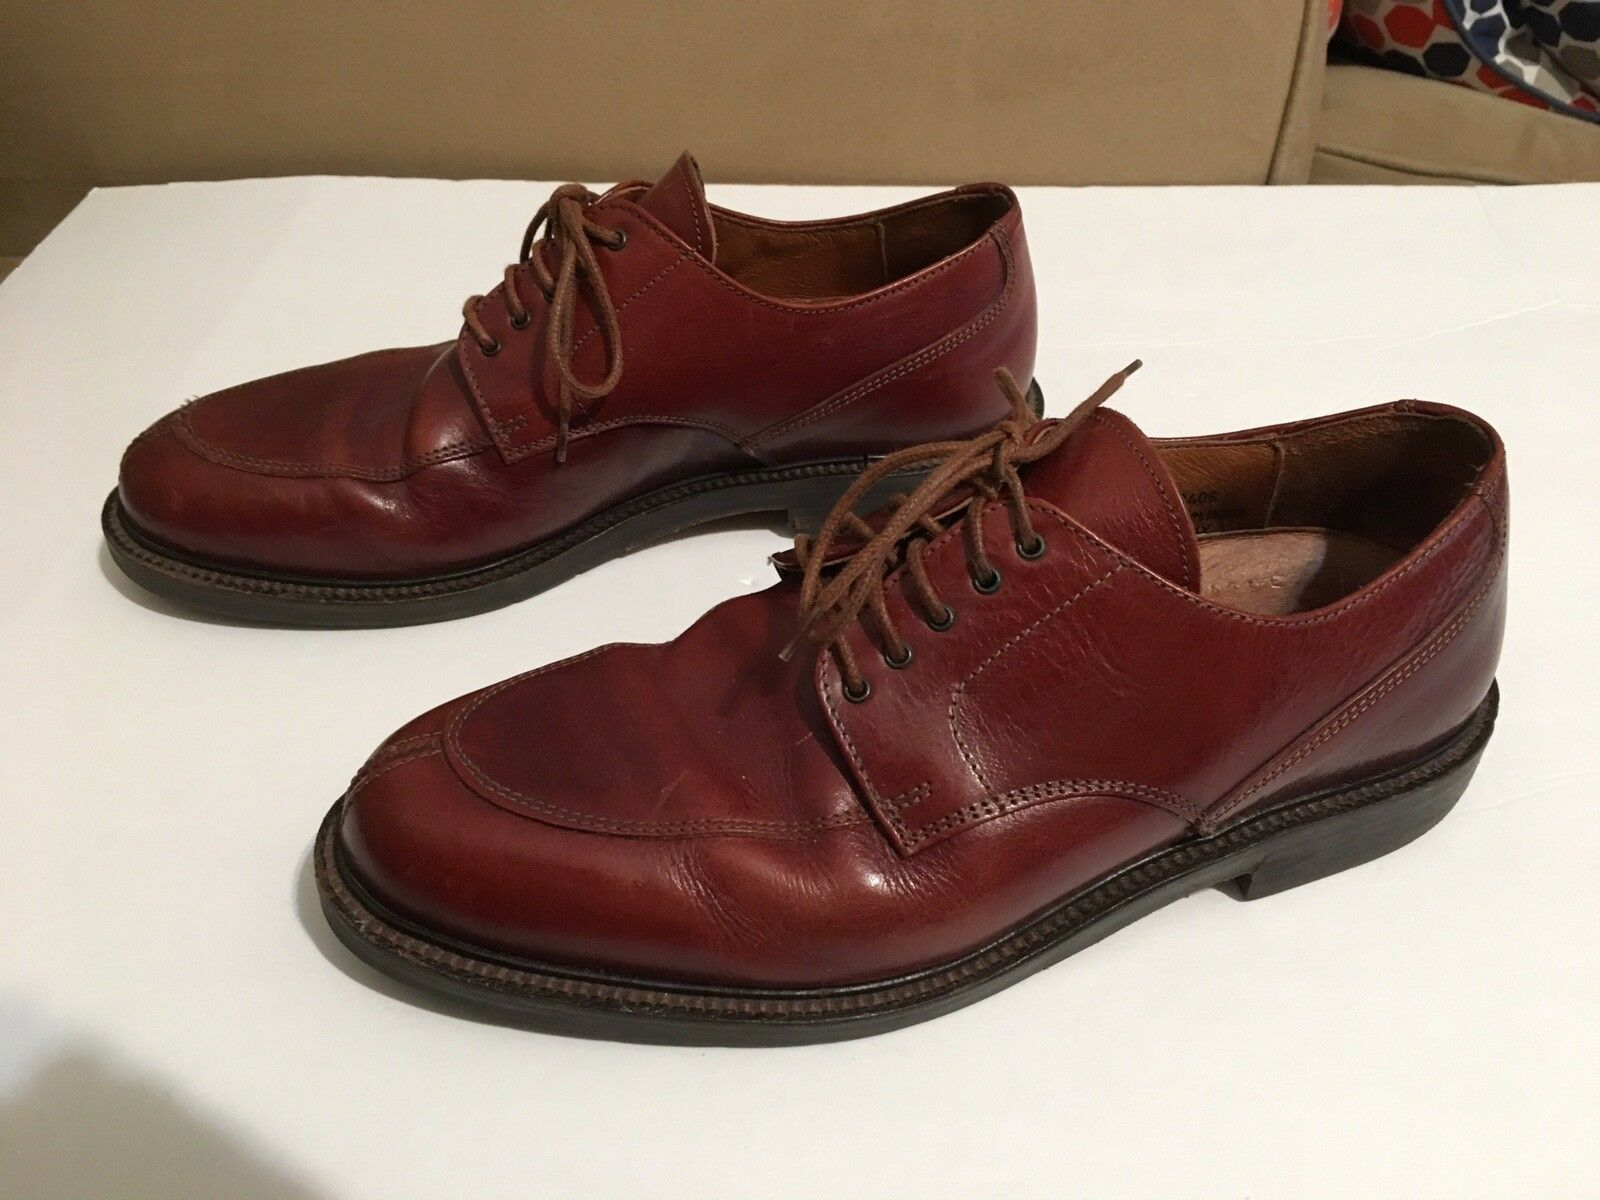 Mens Johnston & Murphy Passport Brown Split Toe Oxford shoes Size 8 M.Made